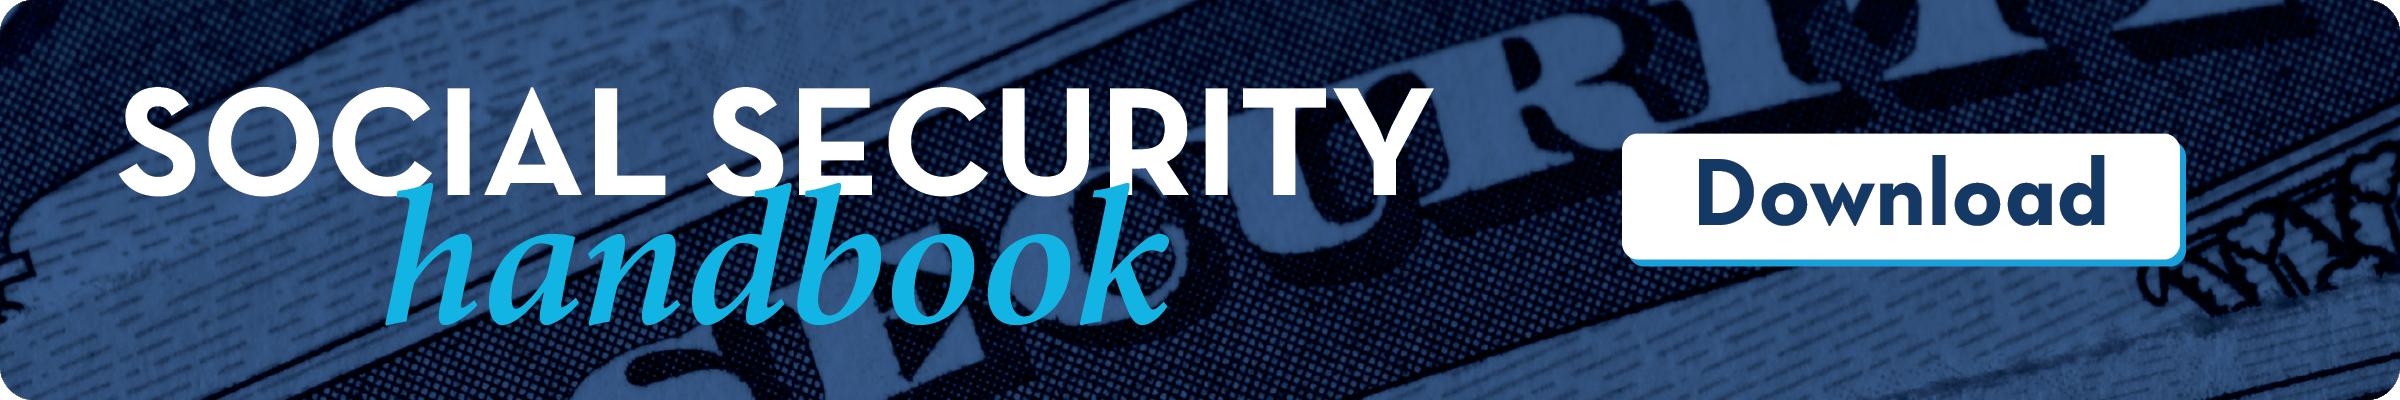 Social Security Handbook: Download Now